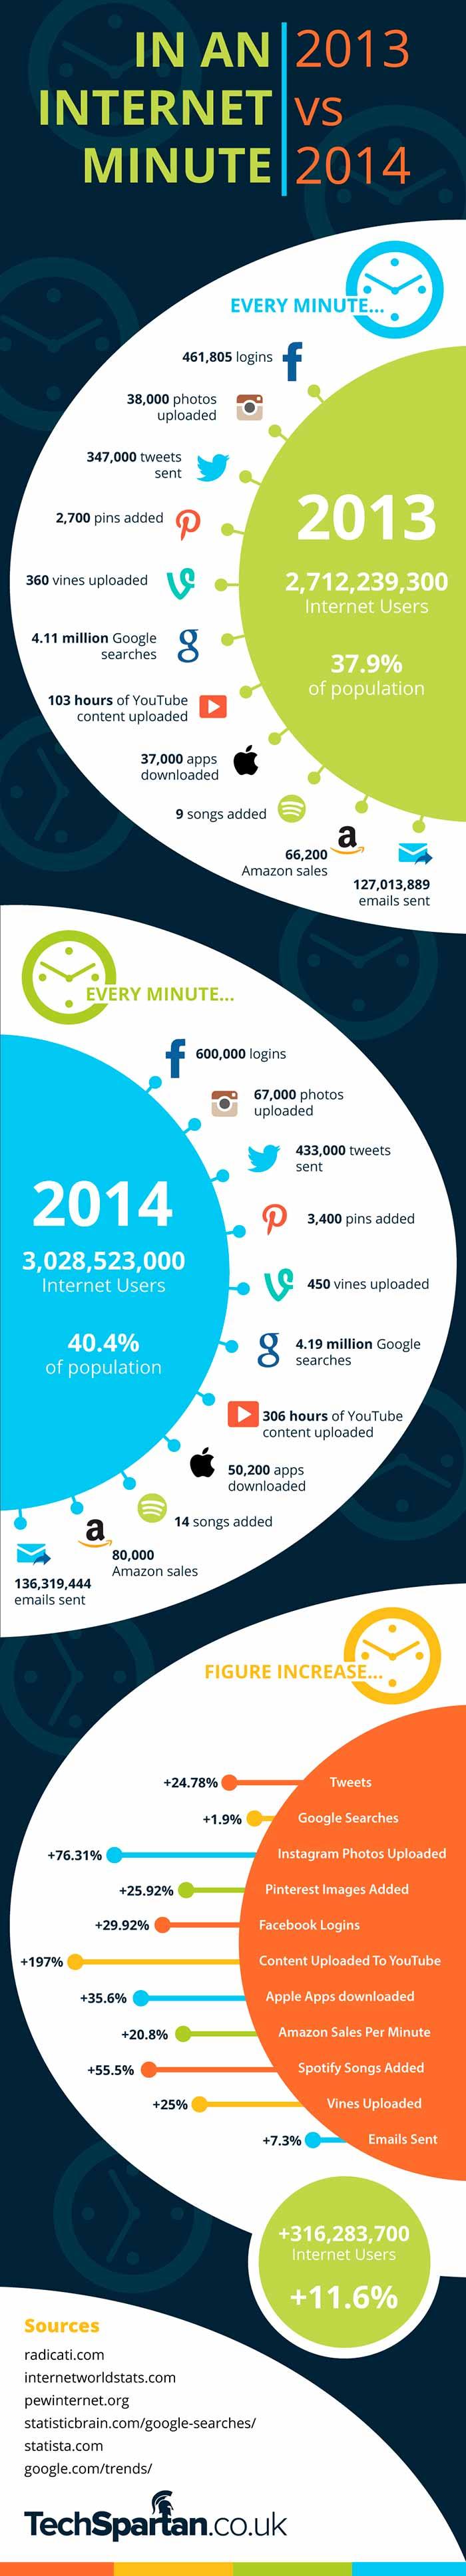 Infografia sobre lo que pasa en un minuto en internet